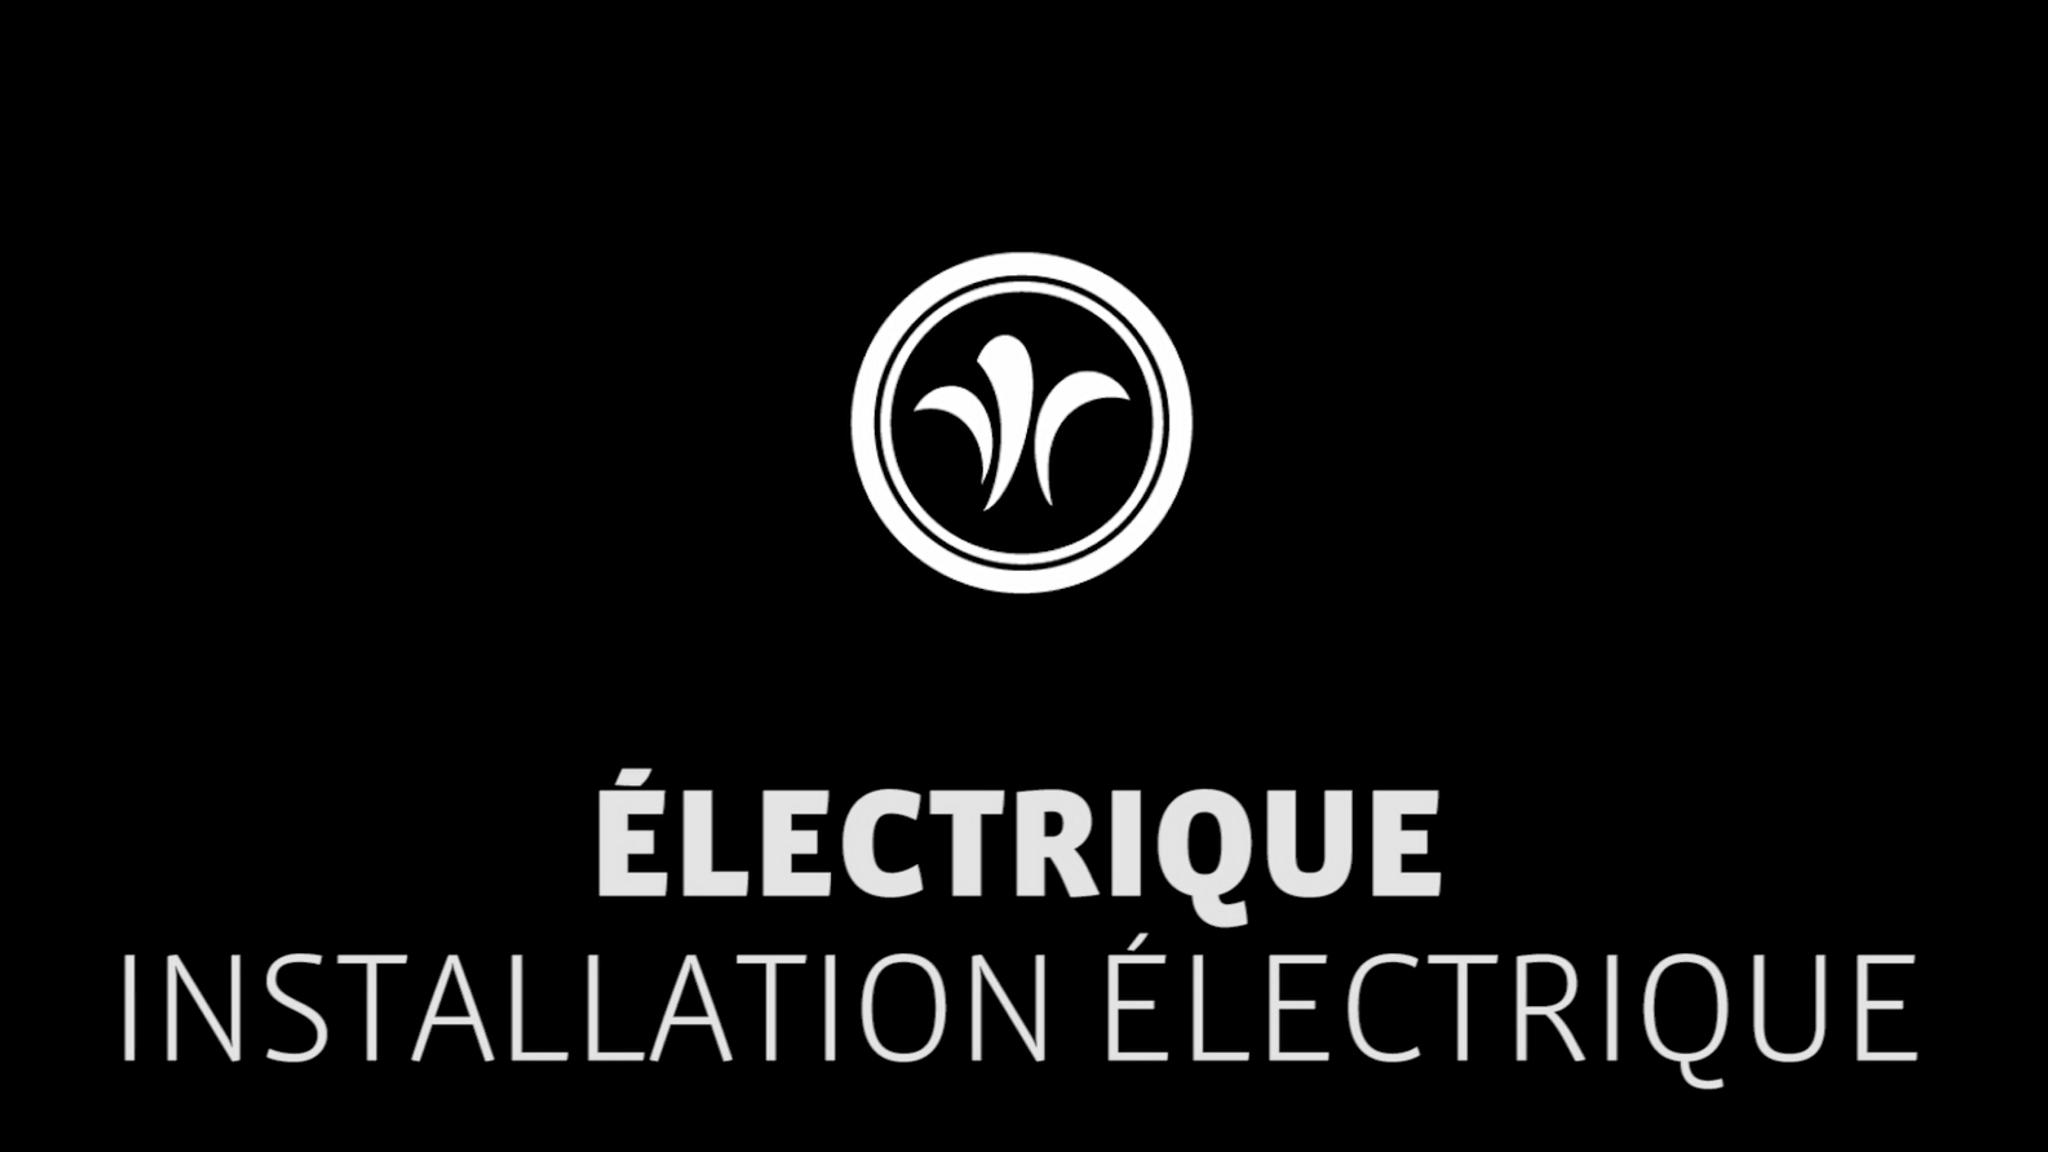 Installation électrique pour camping-car // Niesmann+Bischoff - Camping-car (ARTO) // 2019 // EL8